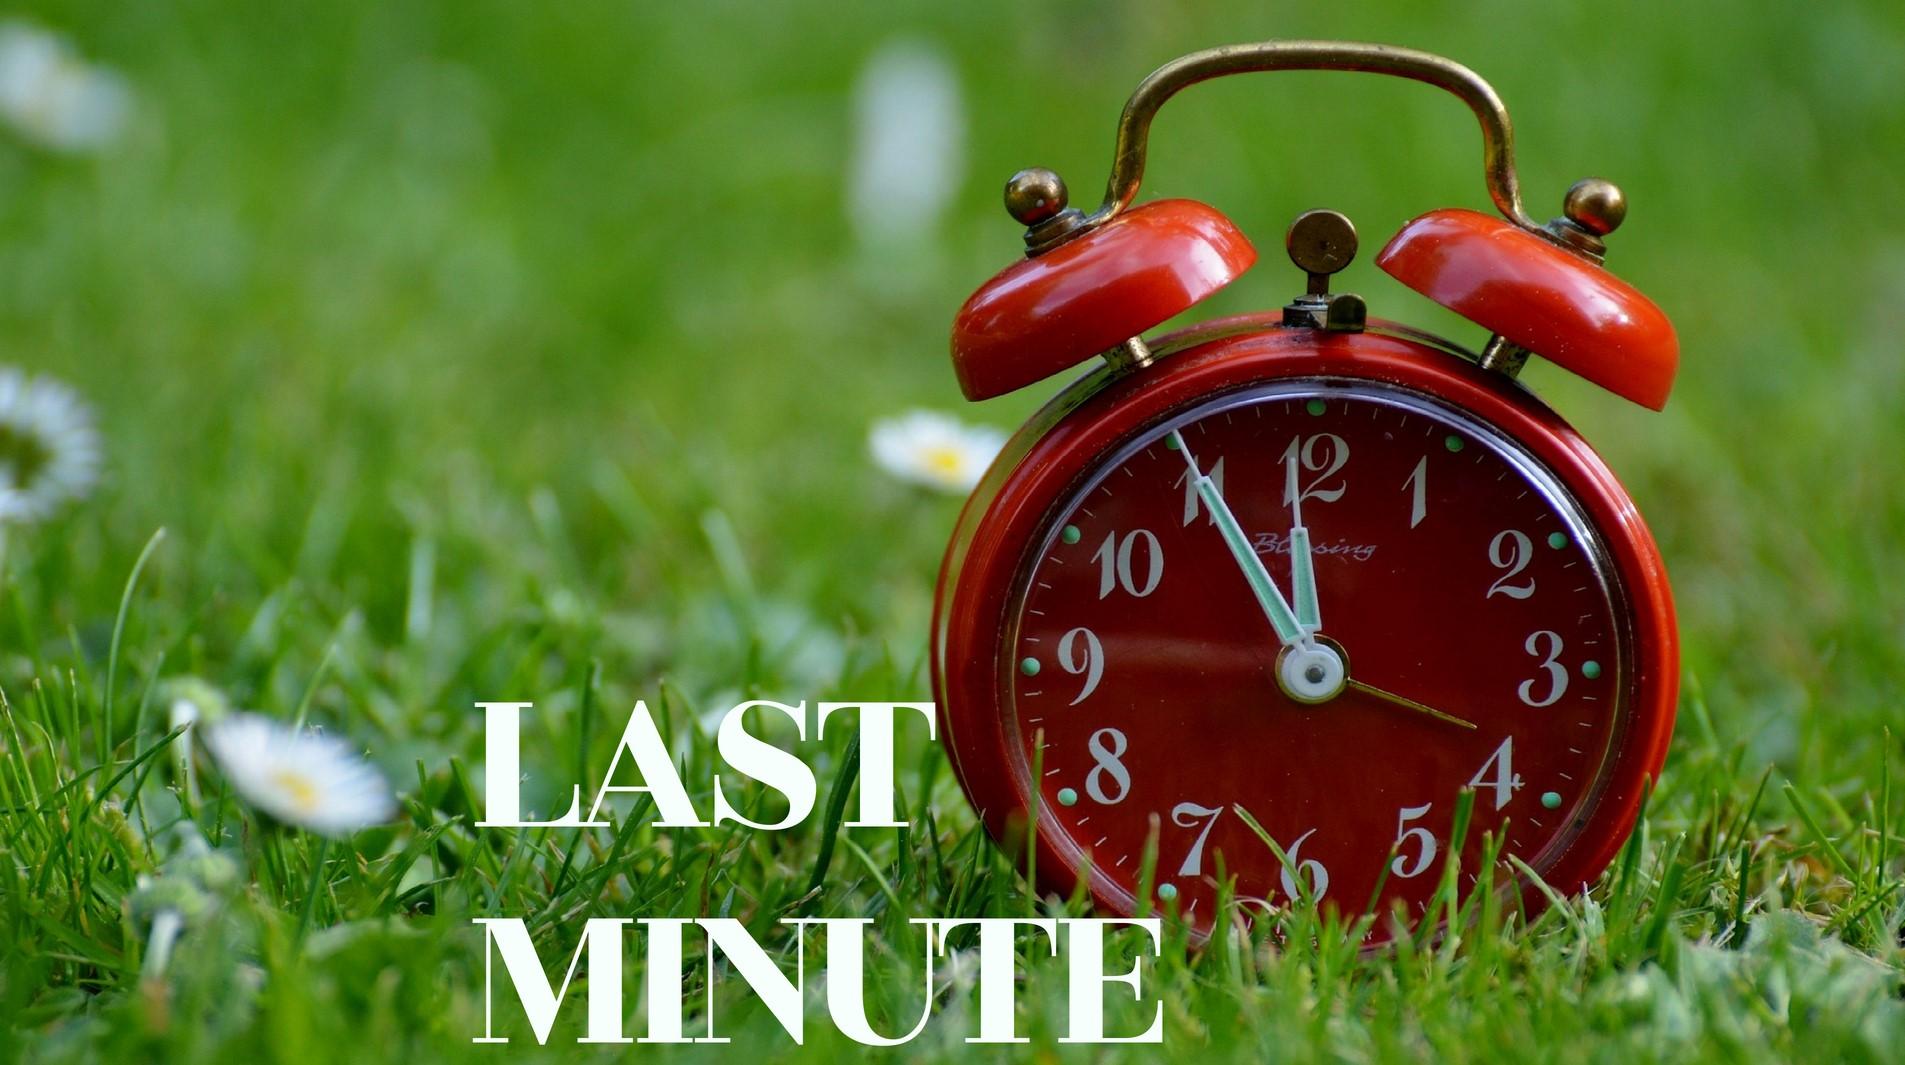 Hotel Fonte Cesia - last minute - Offer - last minute Umbria